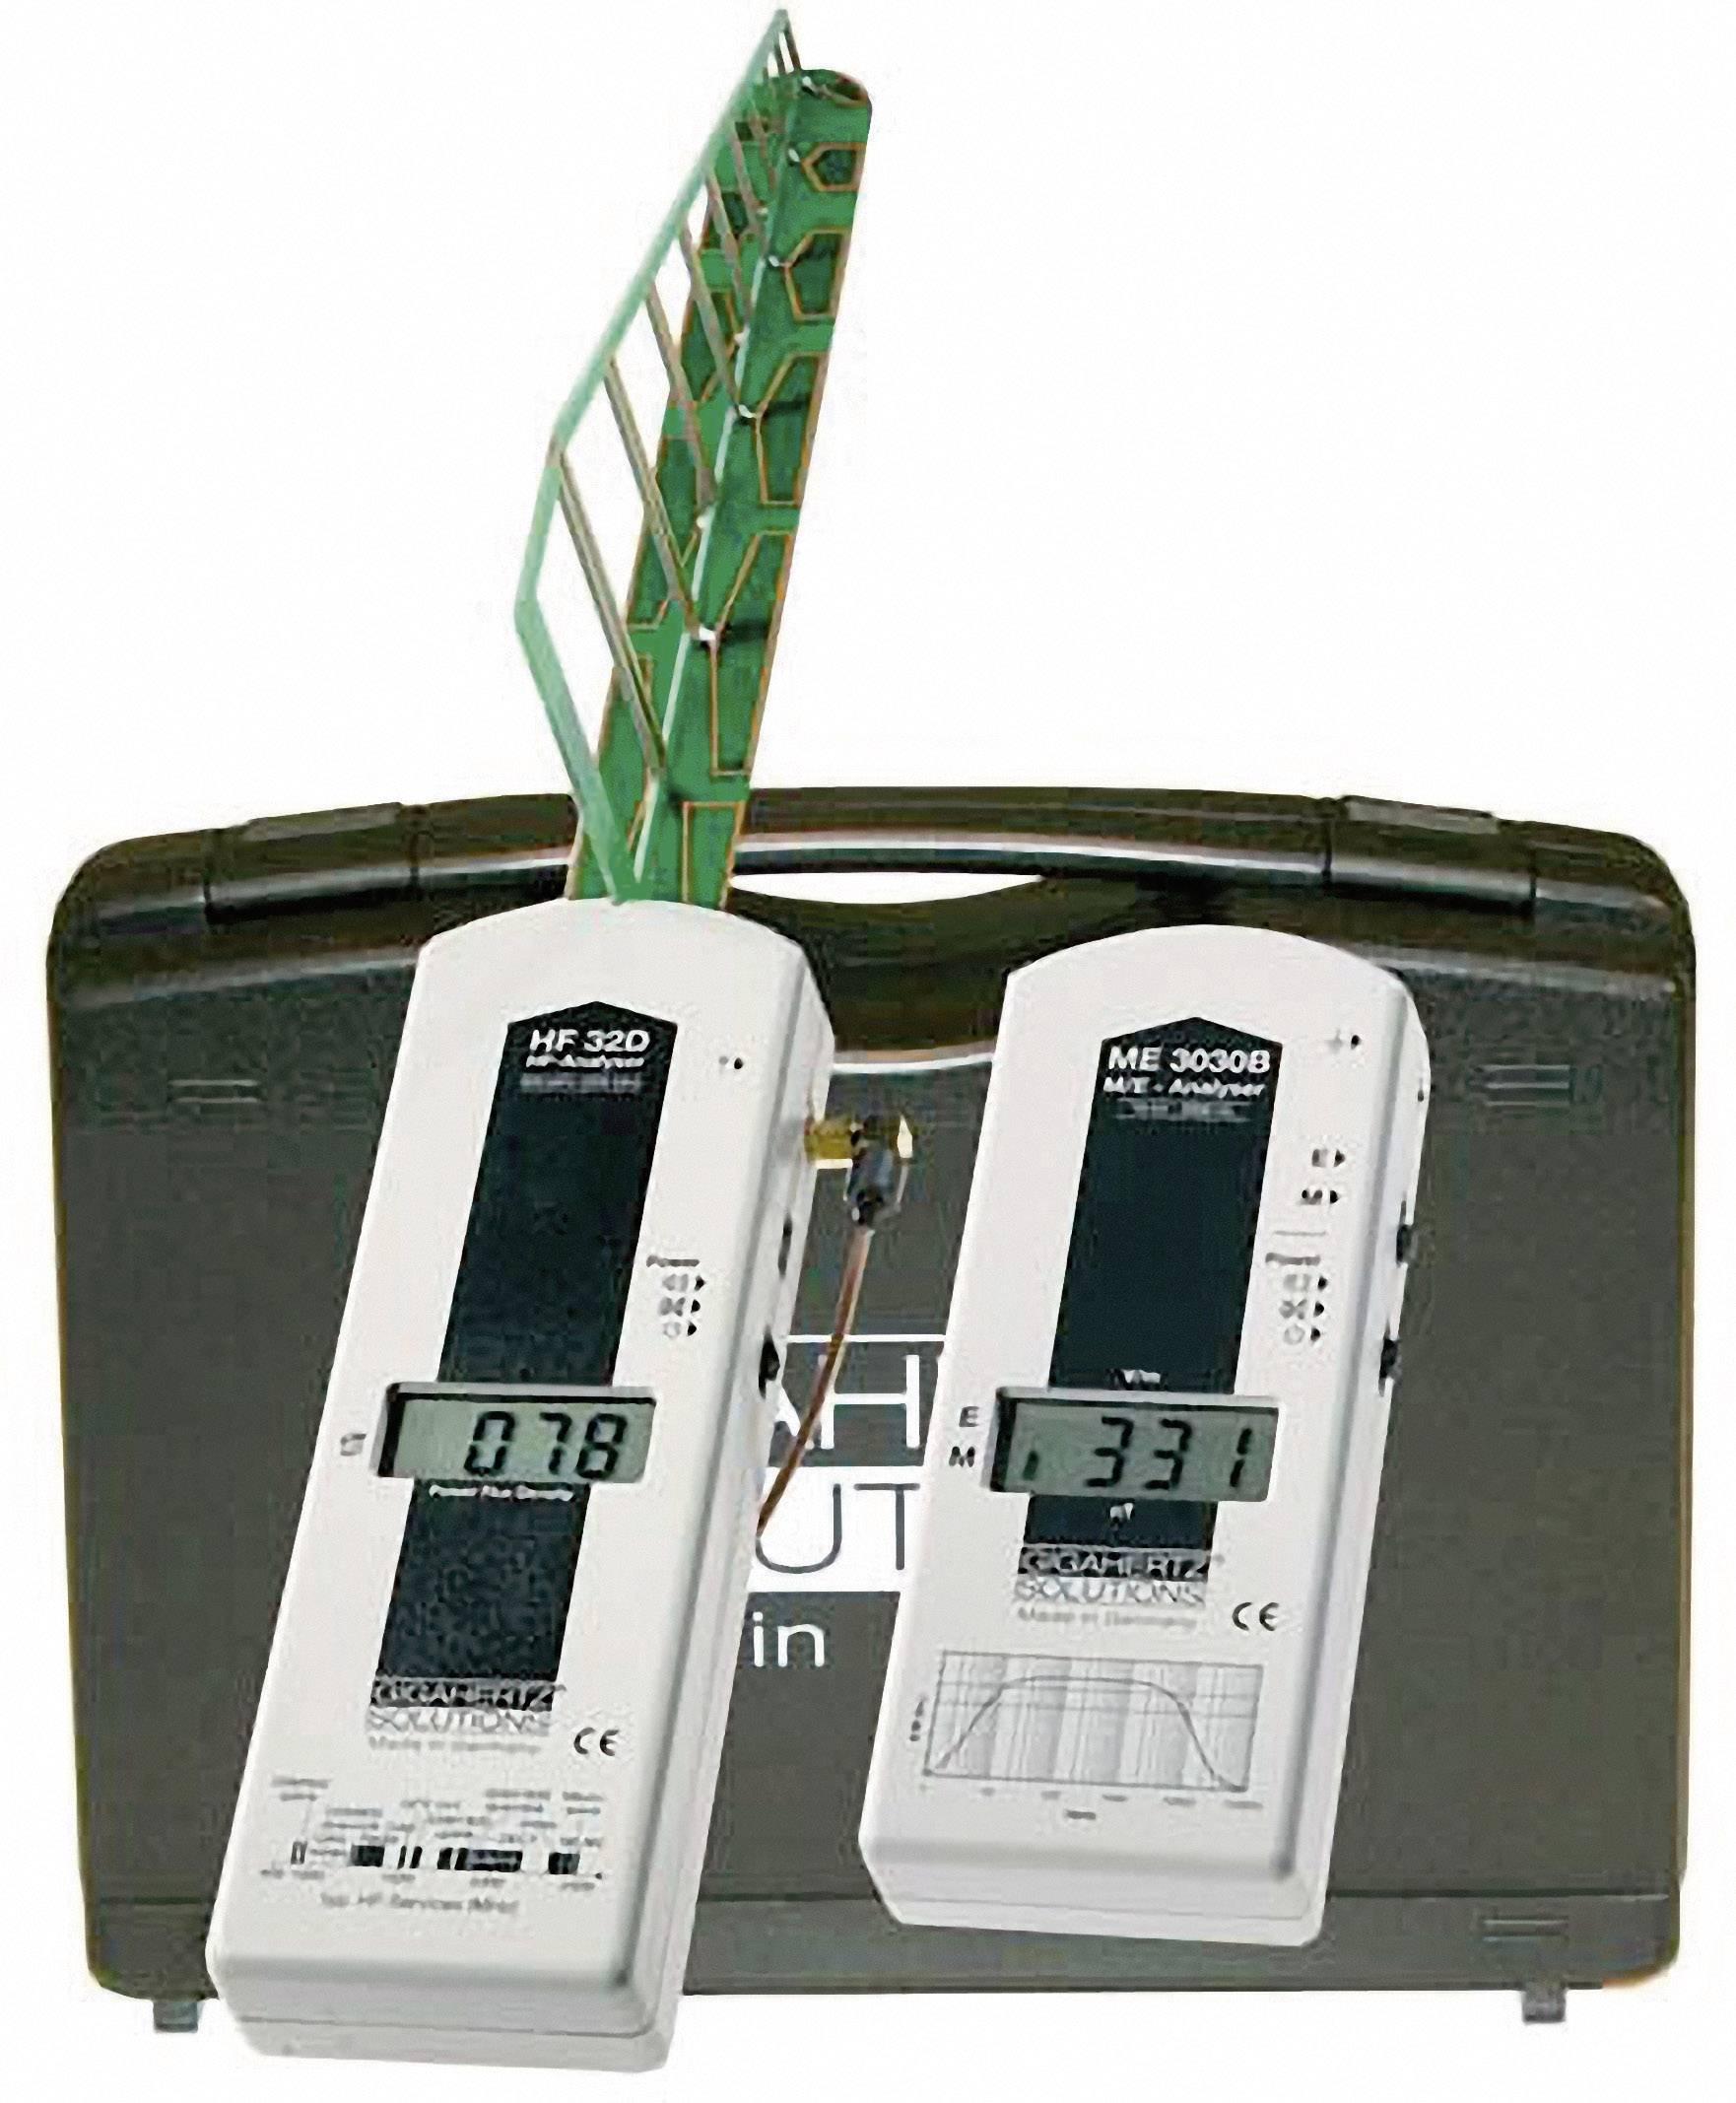 Gigahertz Solutions MK10 -Analysegerät, Elektrosmog-Messgerät, Kalibrováno dle bez certifikátu